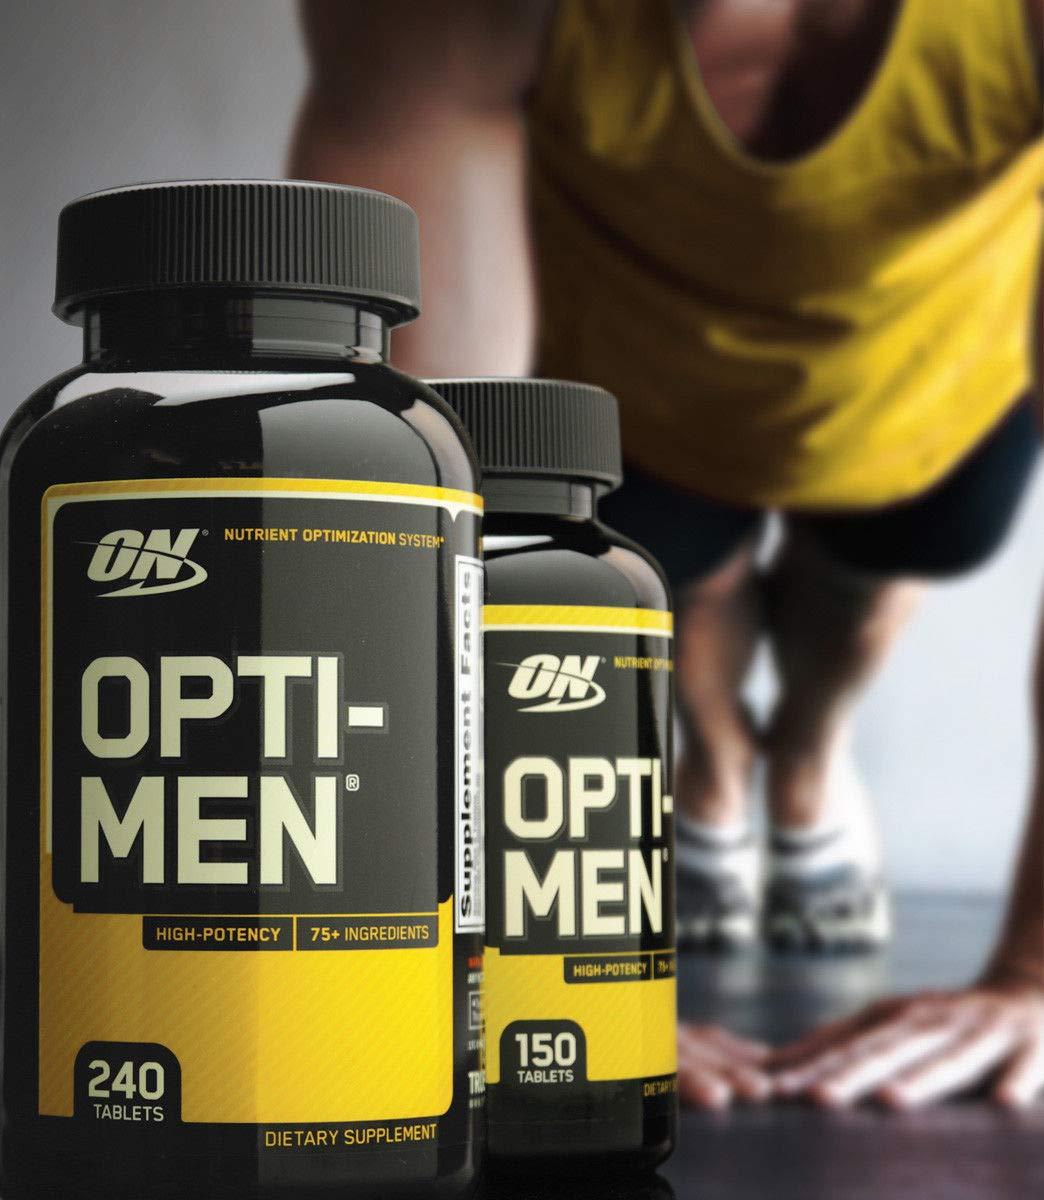 Amazon.com: Optimum Opti-Men Multi-Vitamin Vitamin D Amino Acids B-Complex 240 Tablets: Health & Personal Care